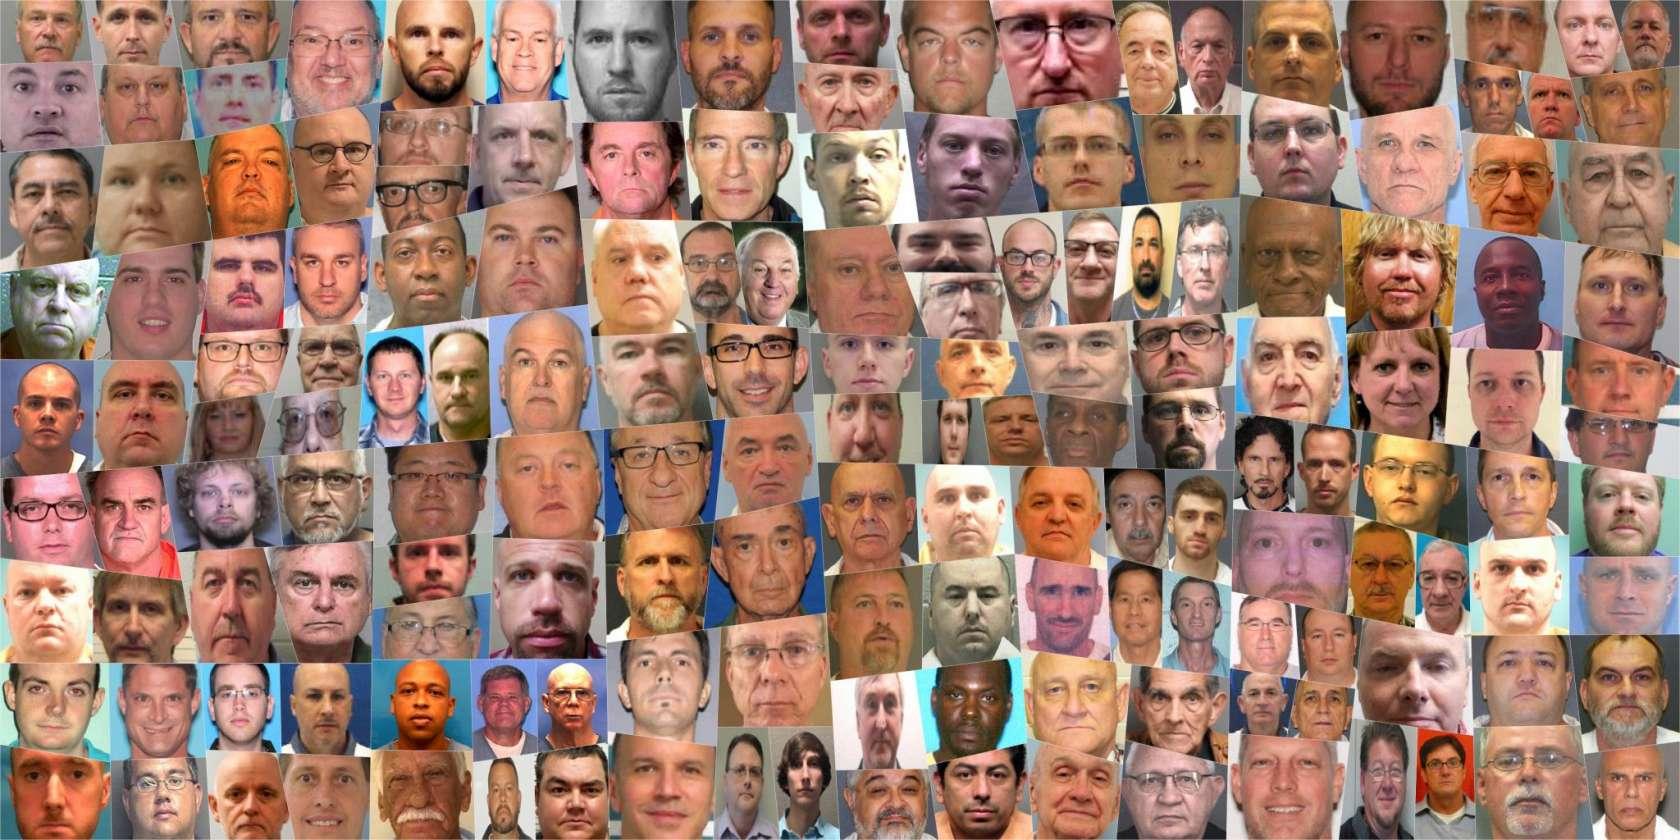 Sex-criminal mugshots 1680x1108